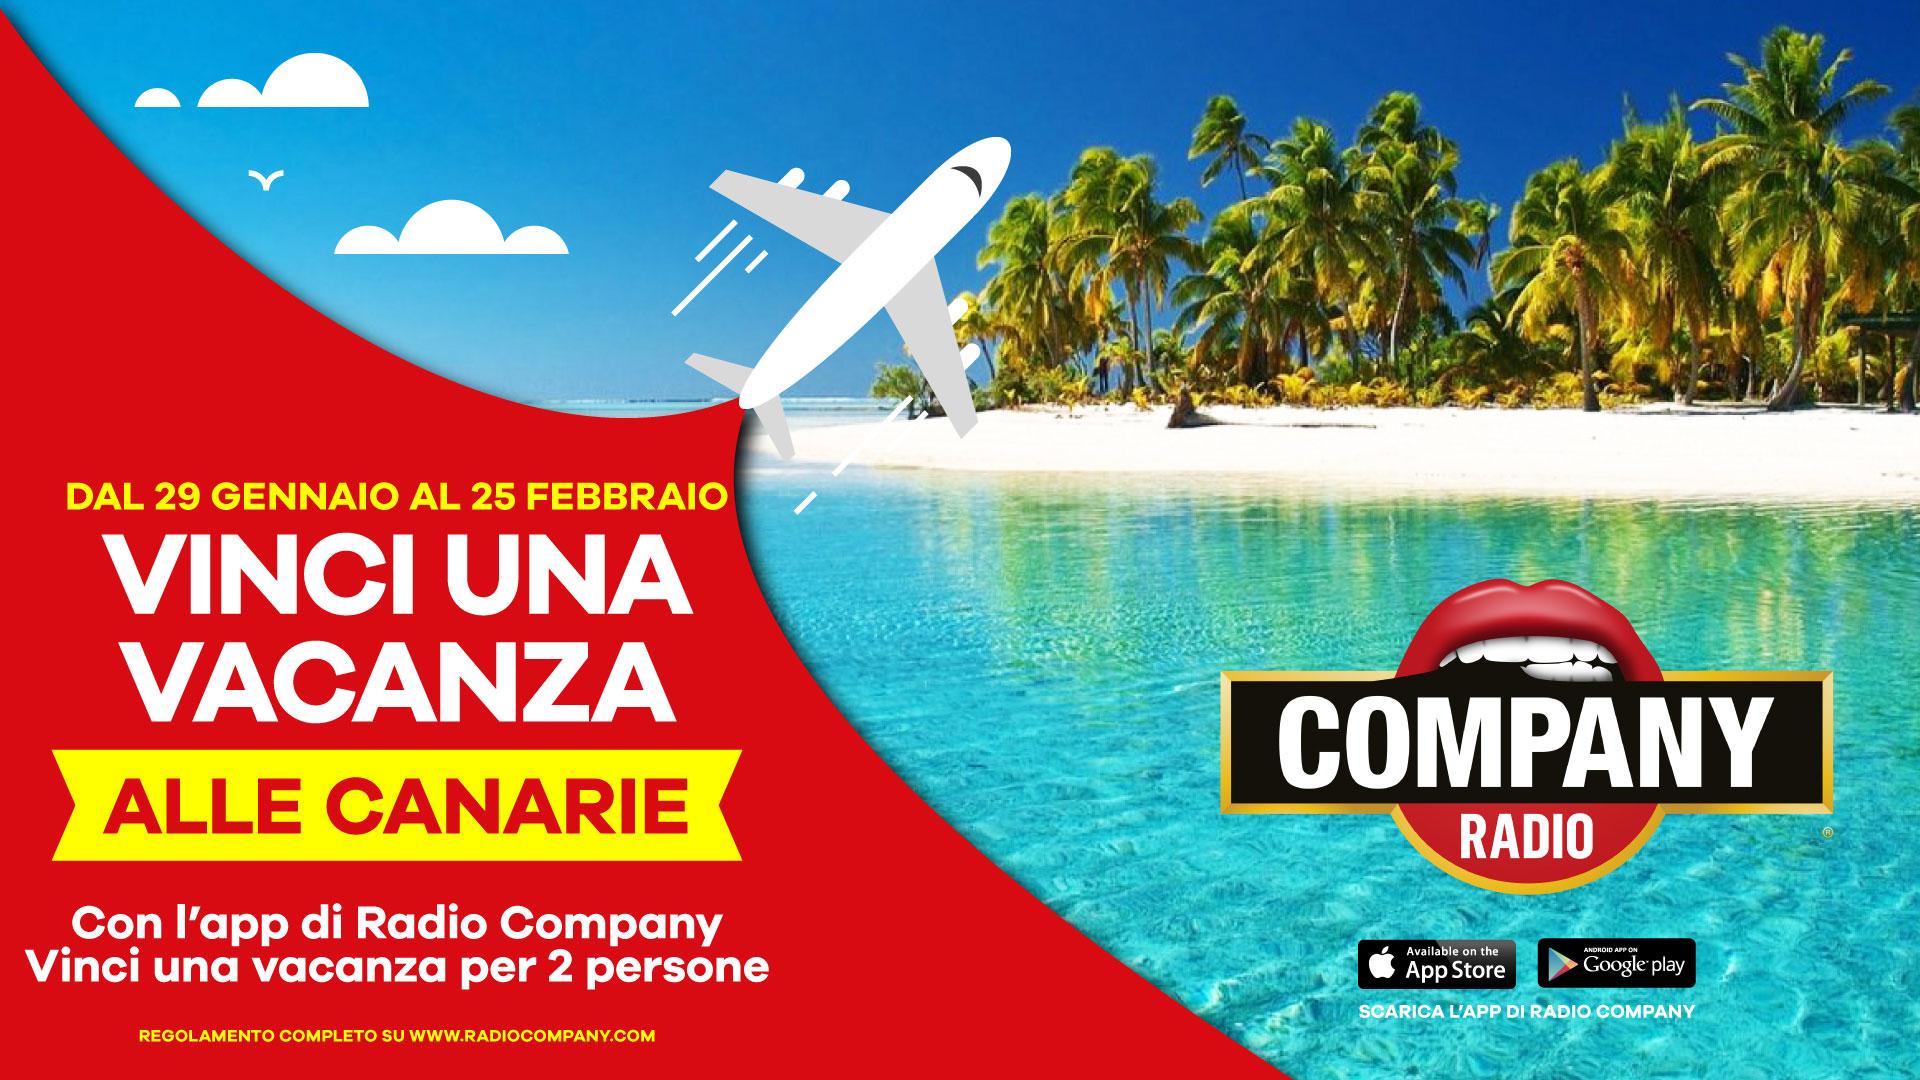 Vinci una vacanza alle Canarie - Radio Company